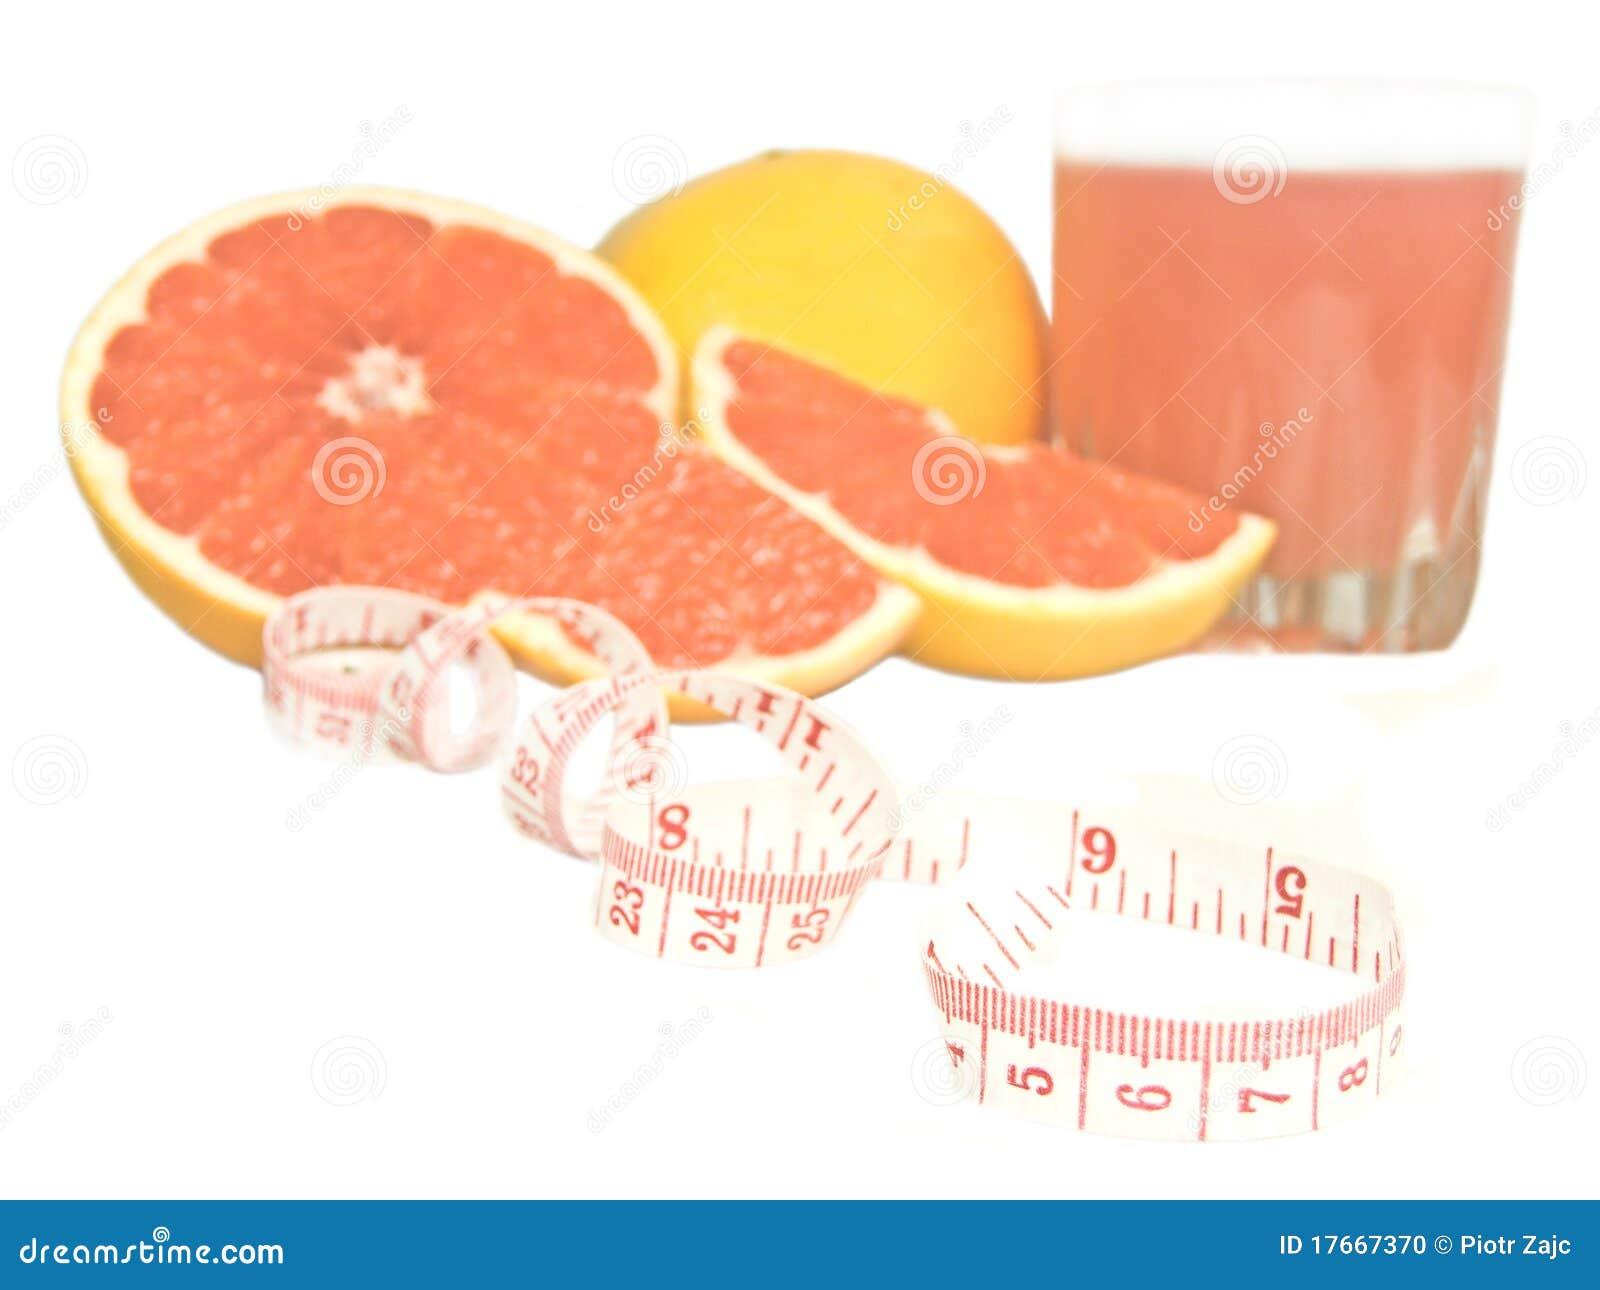 unsweetened white grapefruit juice weight loss